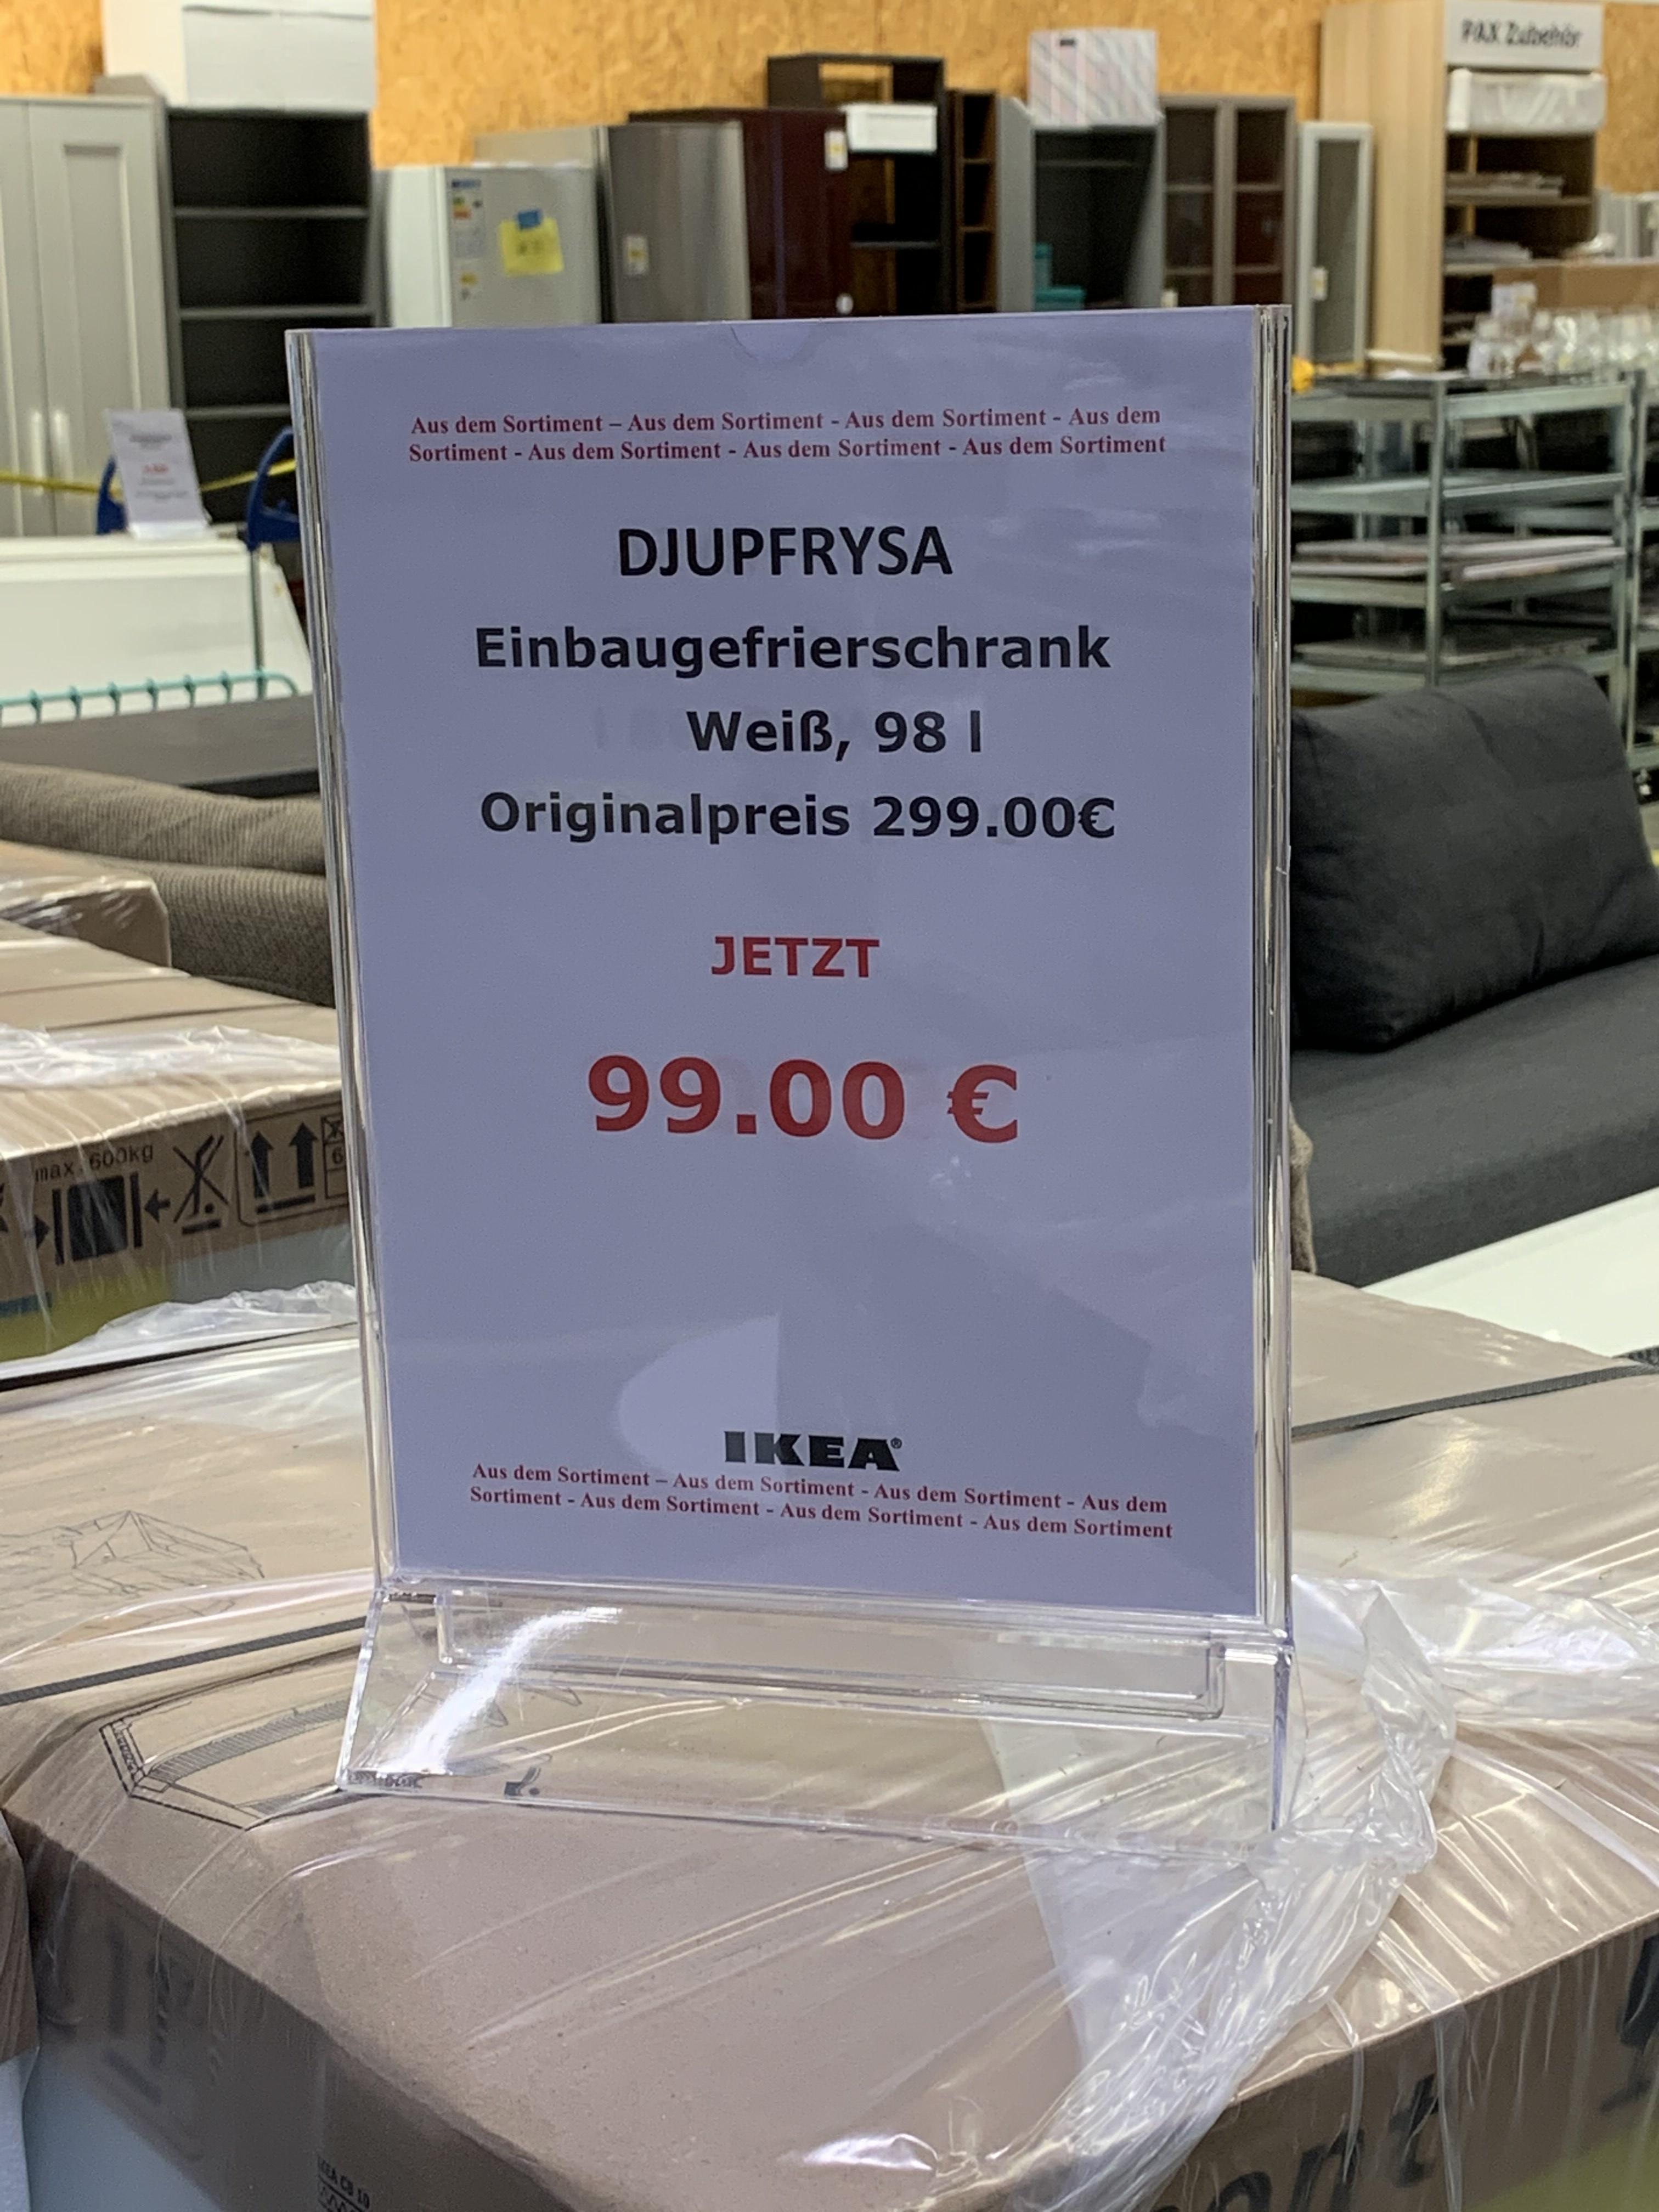 Lokal IKEA Osnabrück Fundgrube DJUPFRYSA Einbau- Gefrierschrank